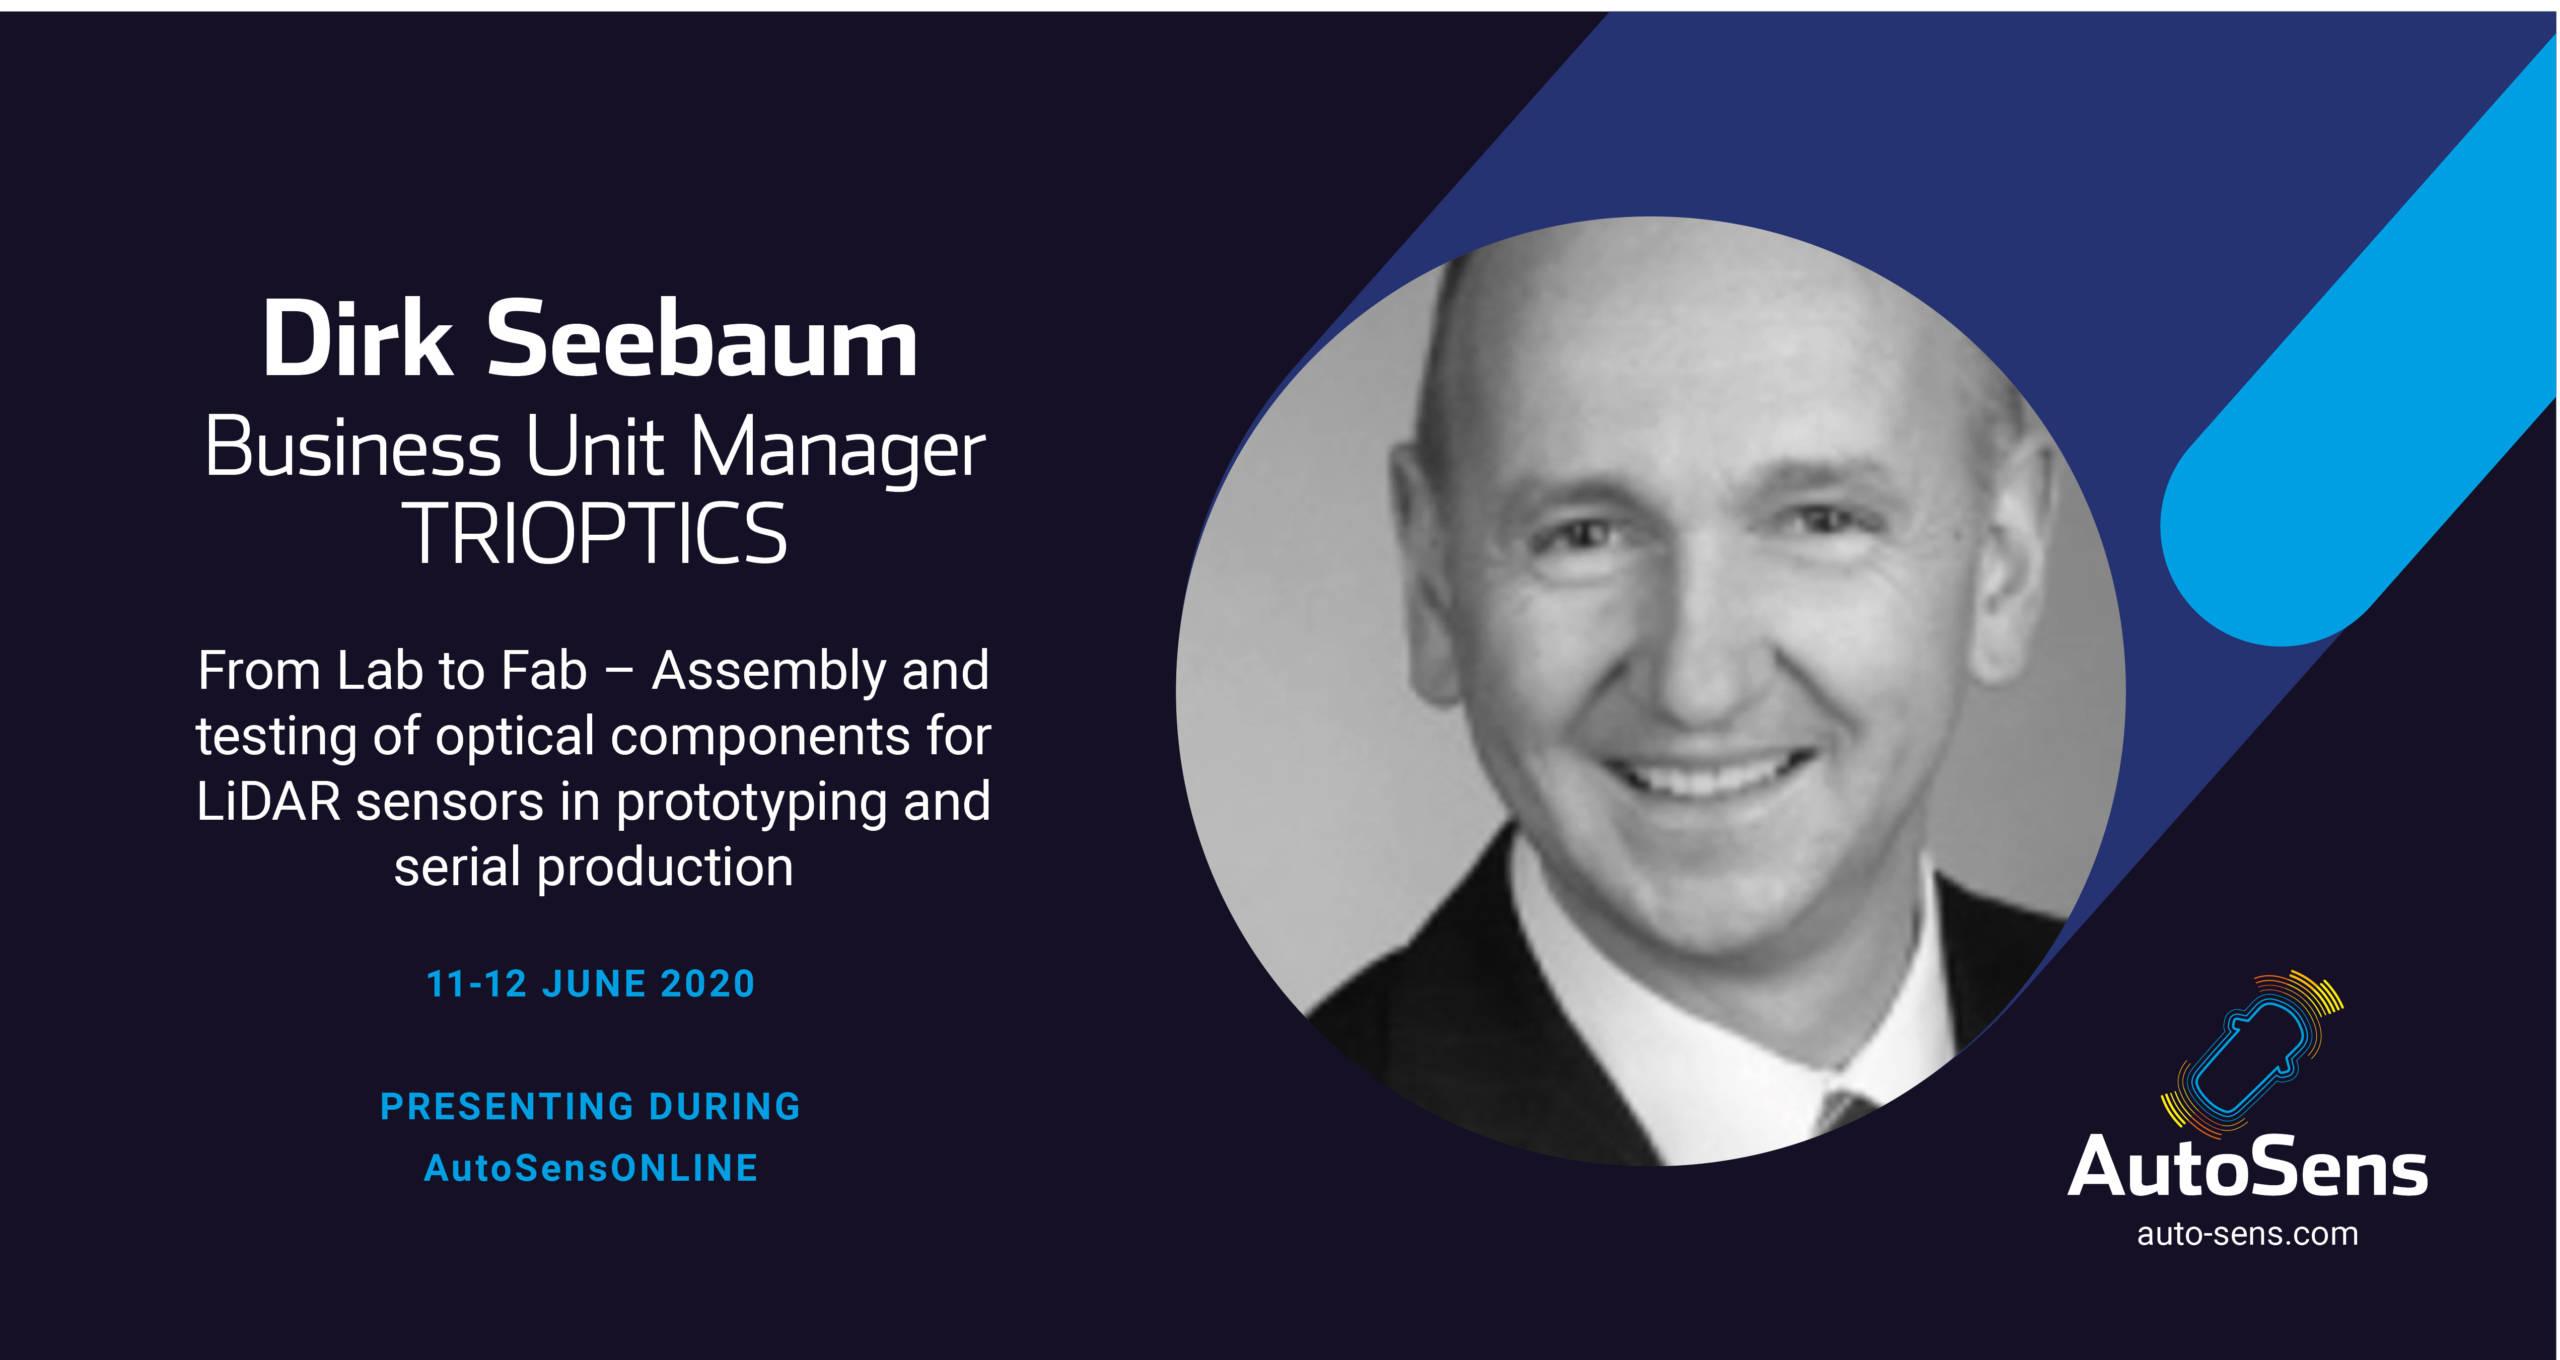 Speaker AutoSens Online Dirk Seebaum